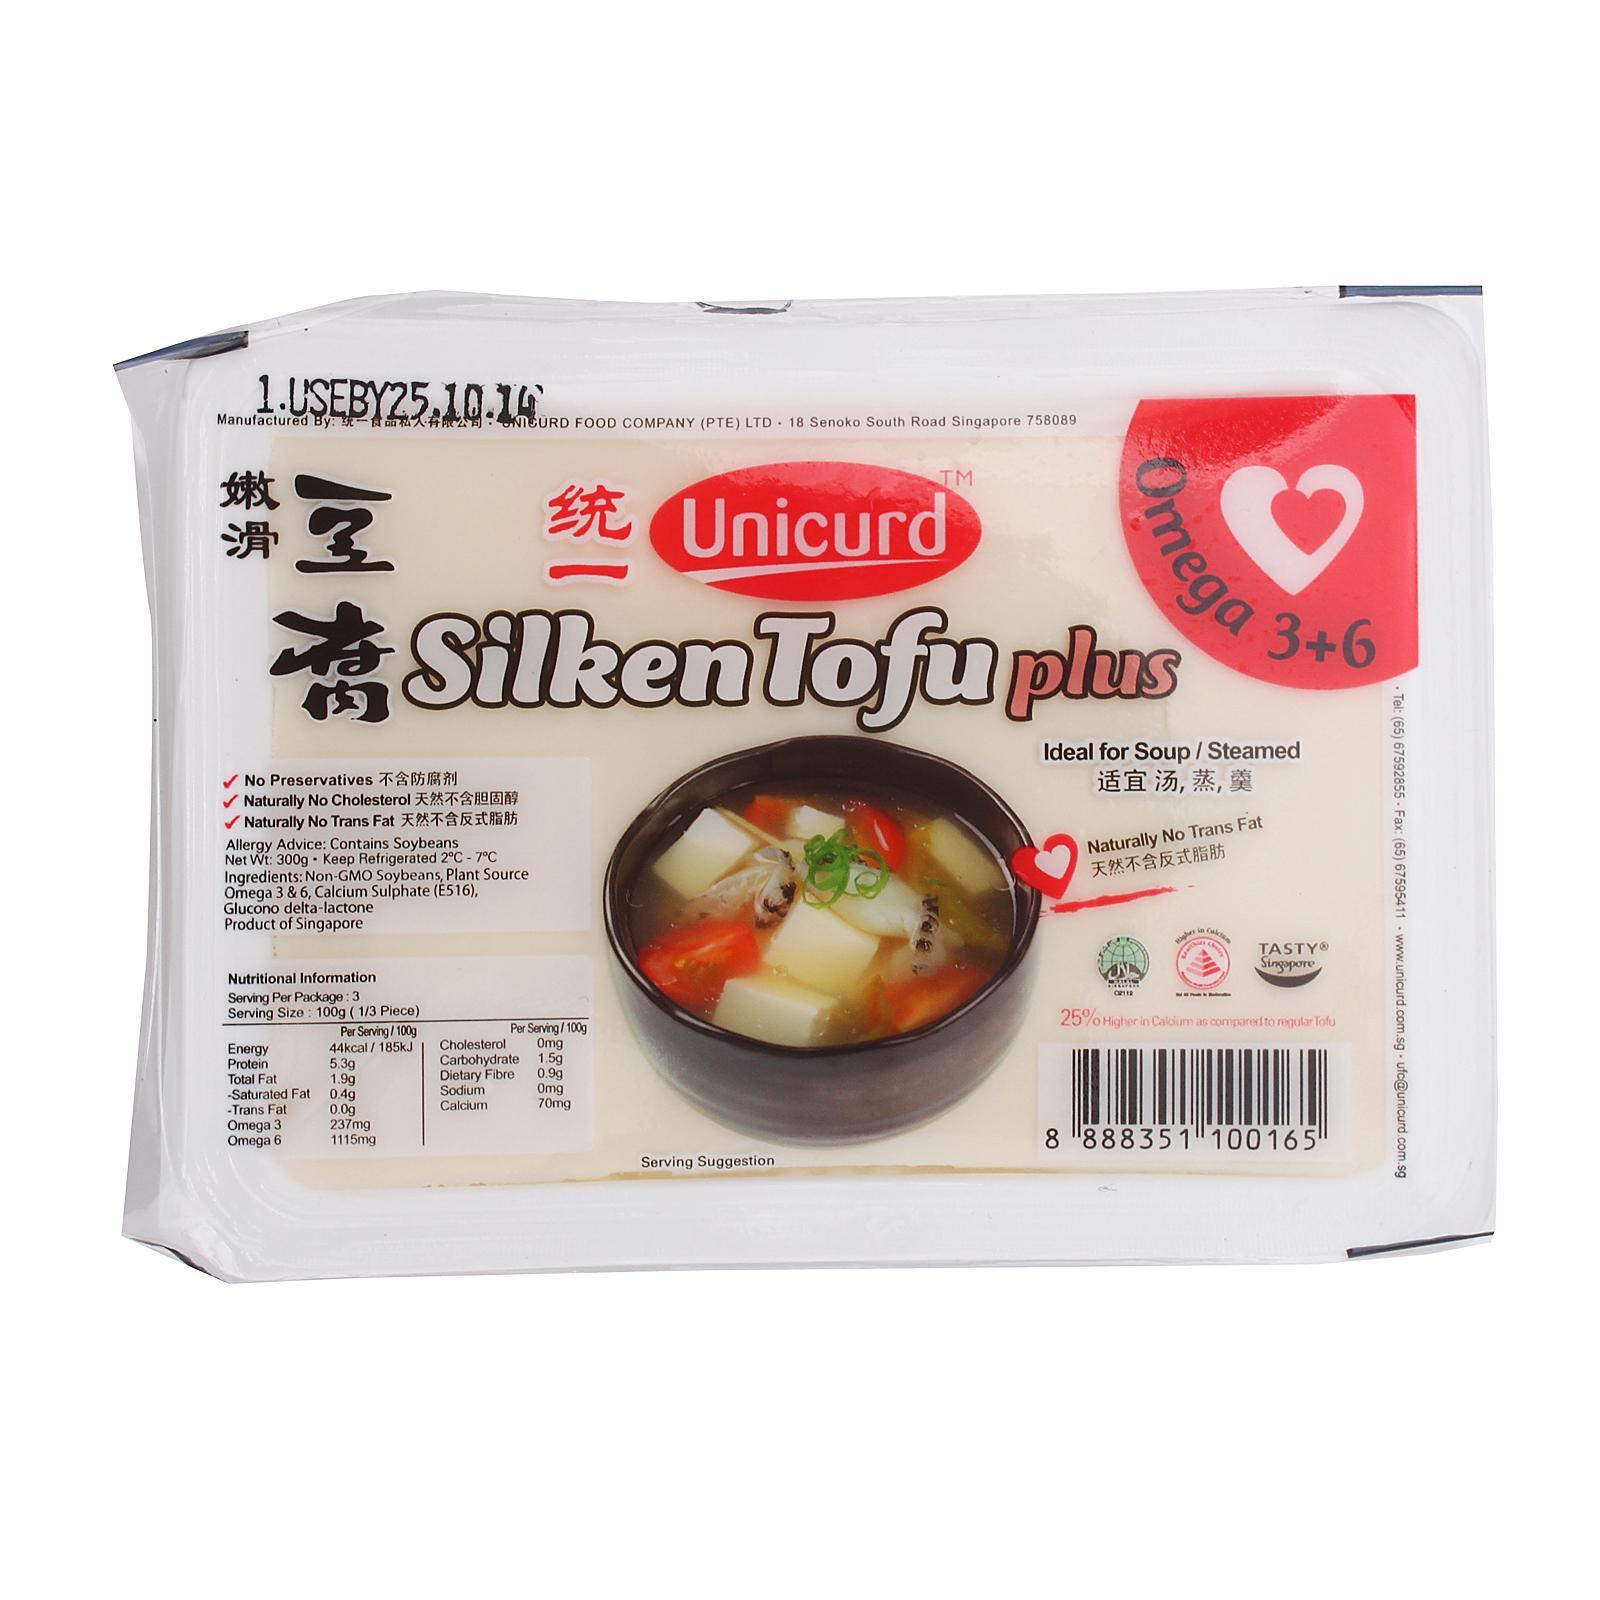 Unicurd Omega Silken Tofu Plus (Box)